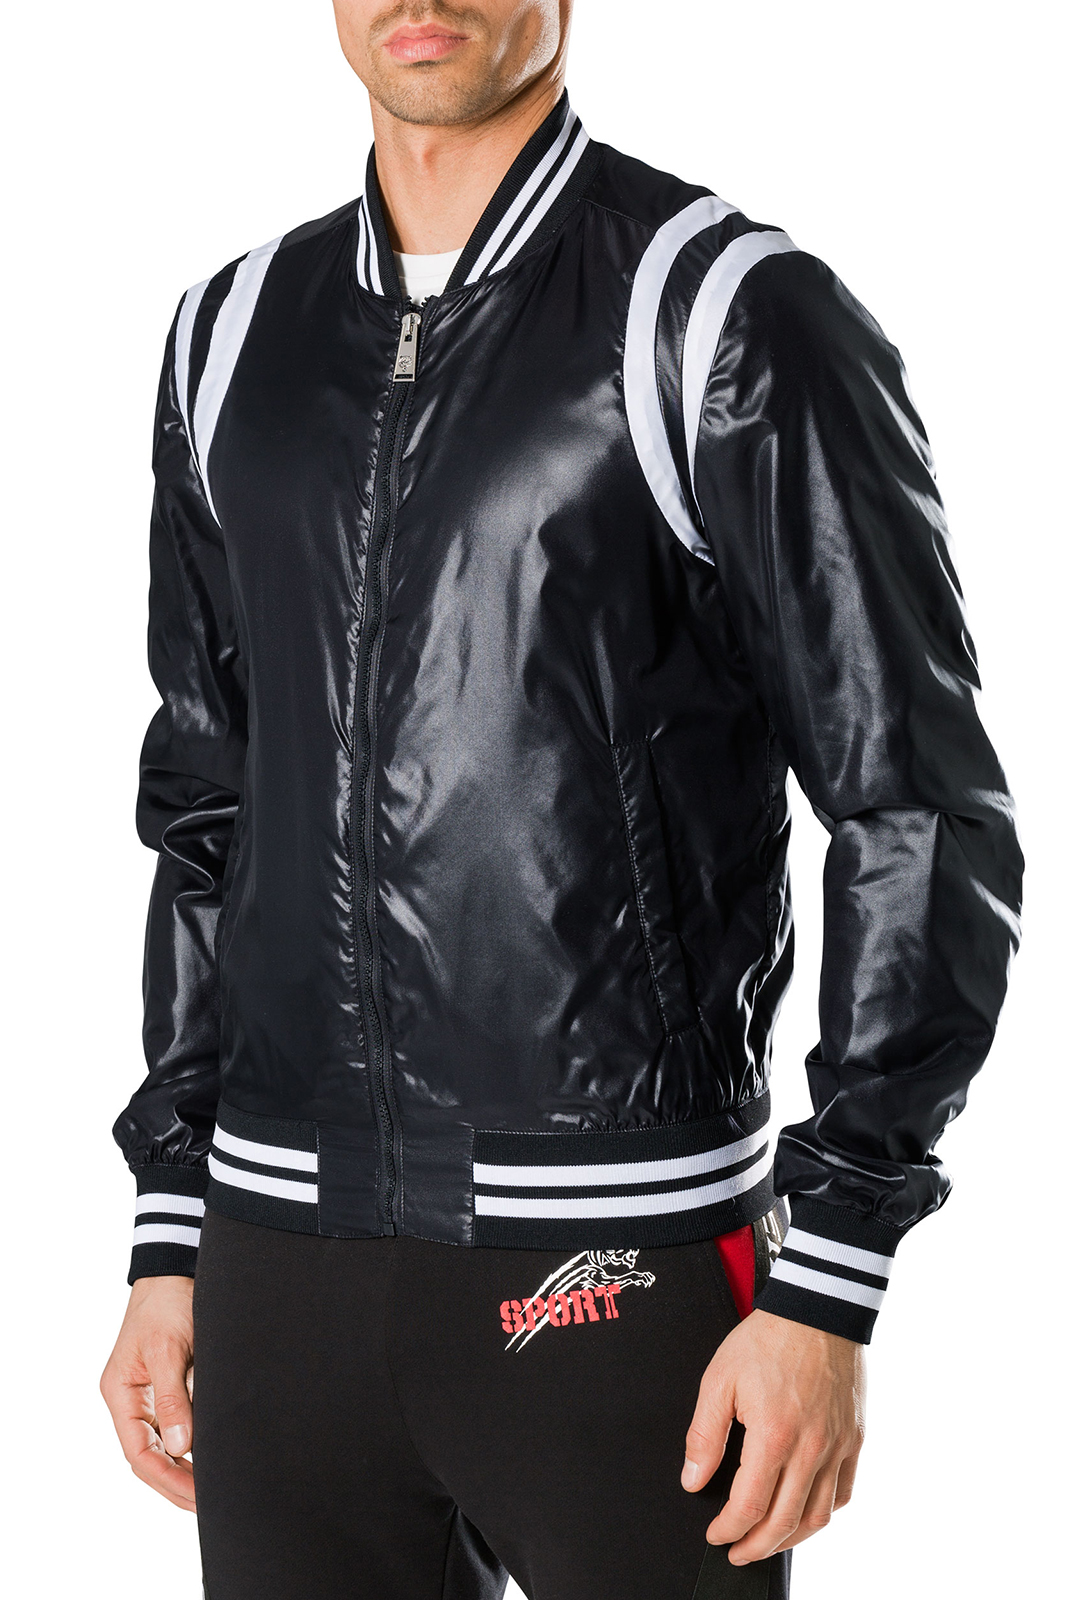 Vestes zippées  Plein Sport F17C MRB0271 02 BLACK